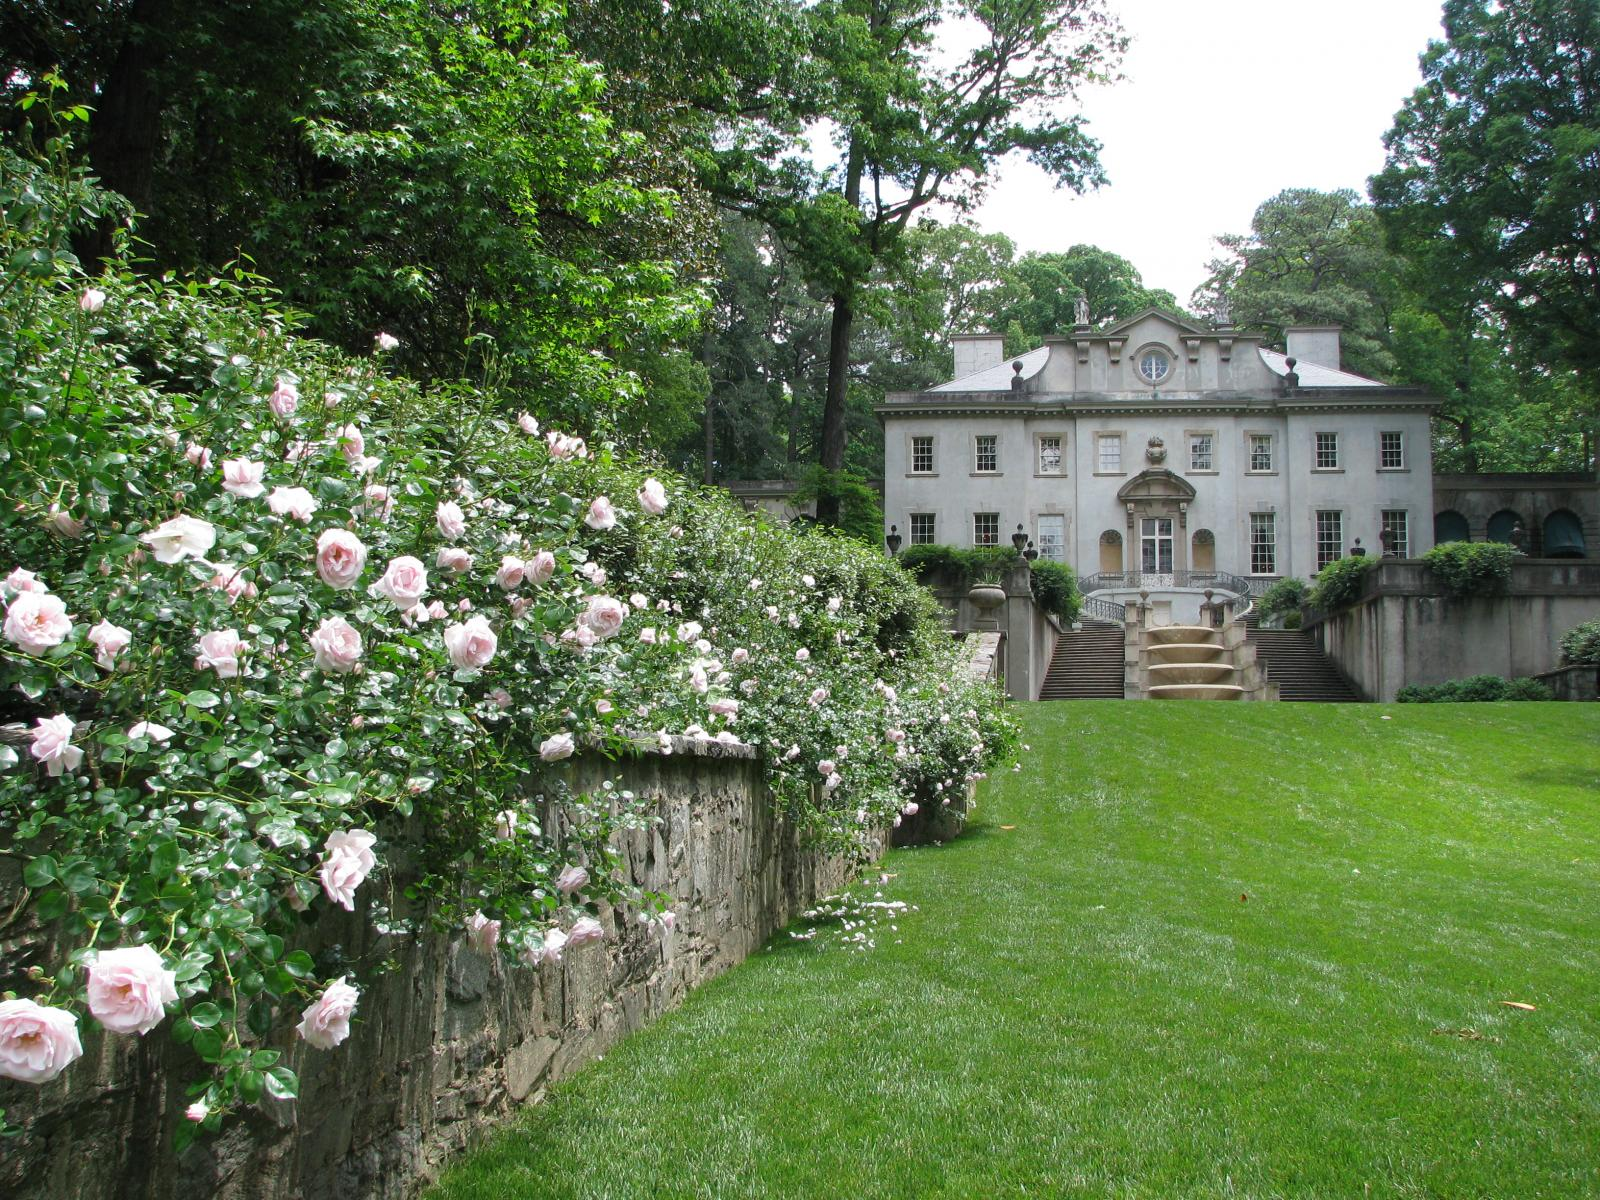 What is a public garden american public gardens association for American garden association